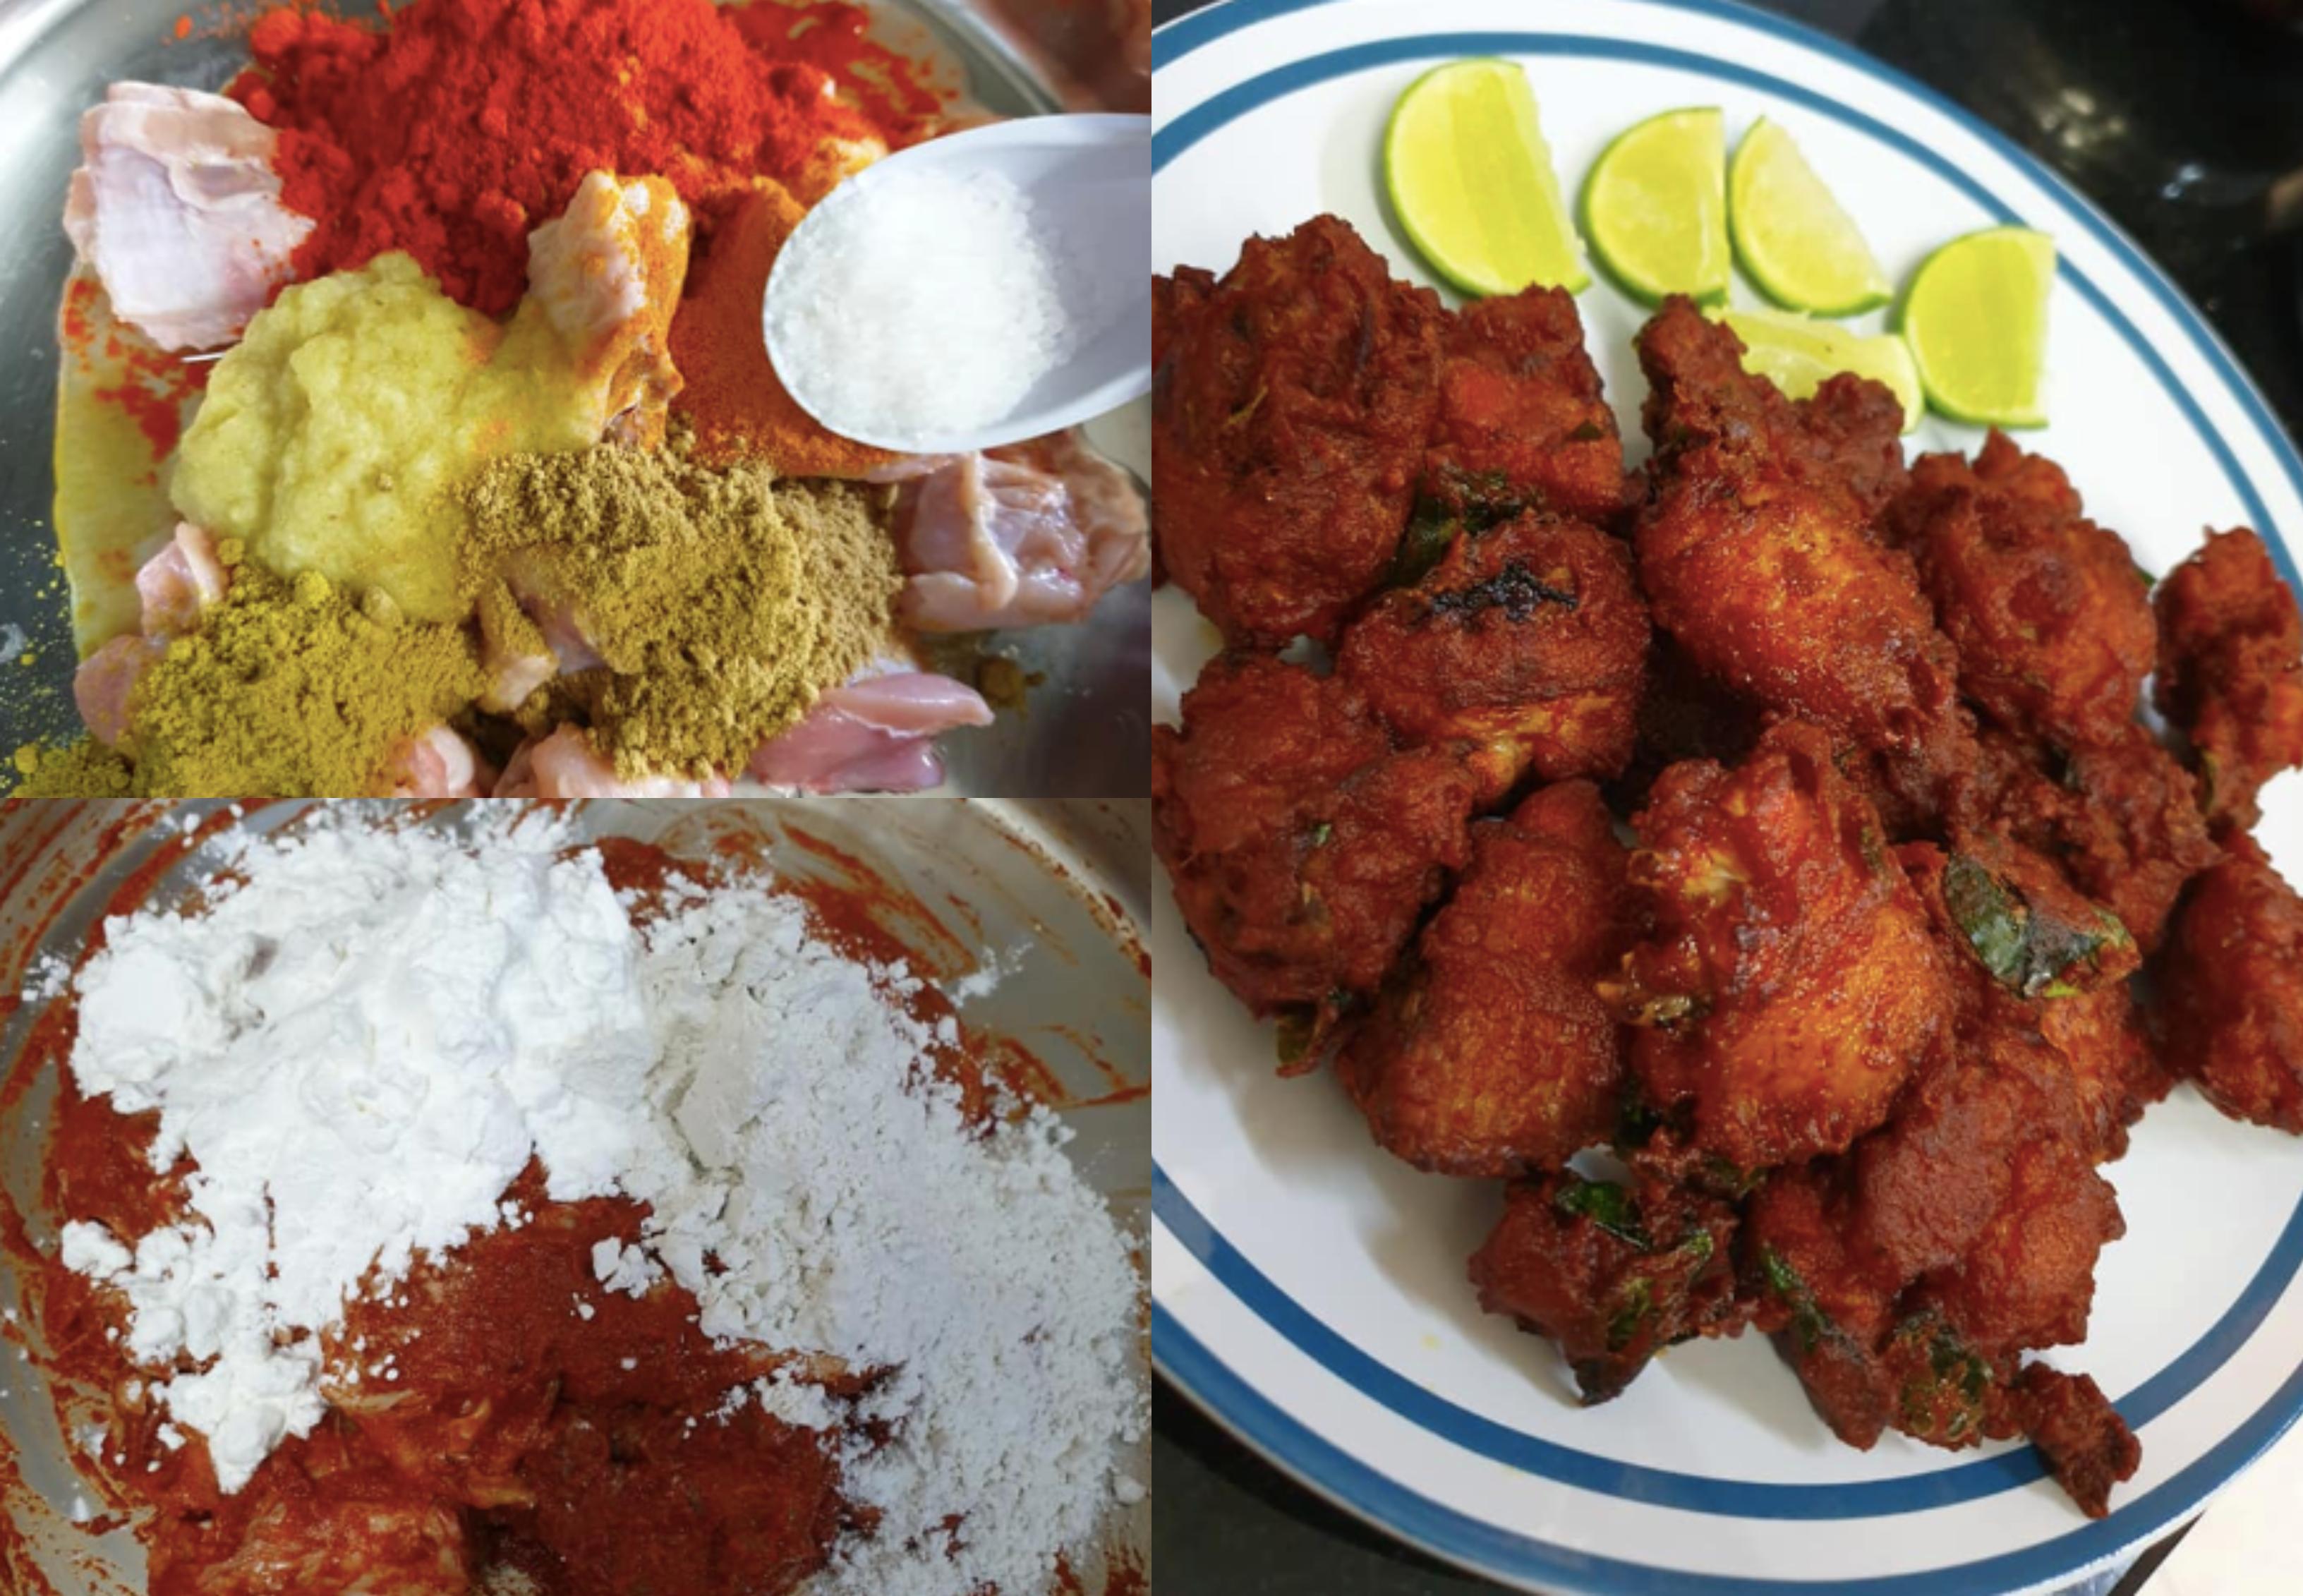 Resepi Ayam Goreng Berempah Ala Mamak Rangup Di Luar Juicy Di Dalam